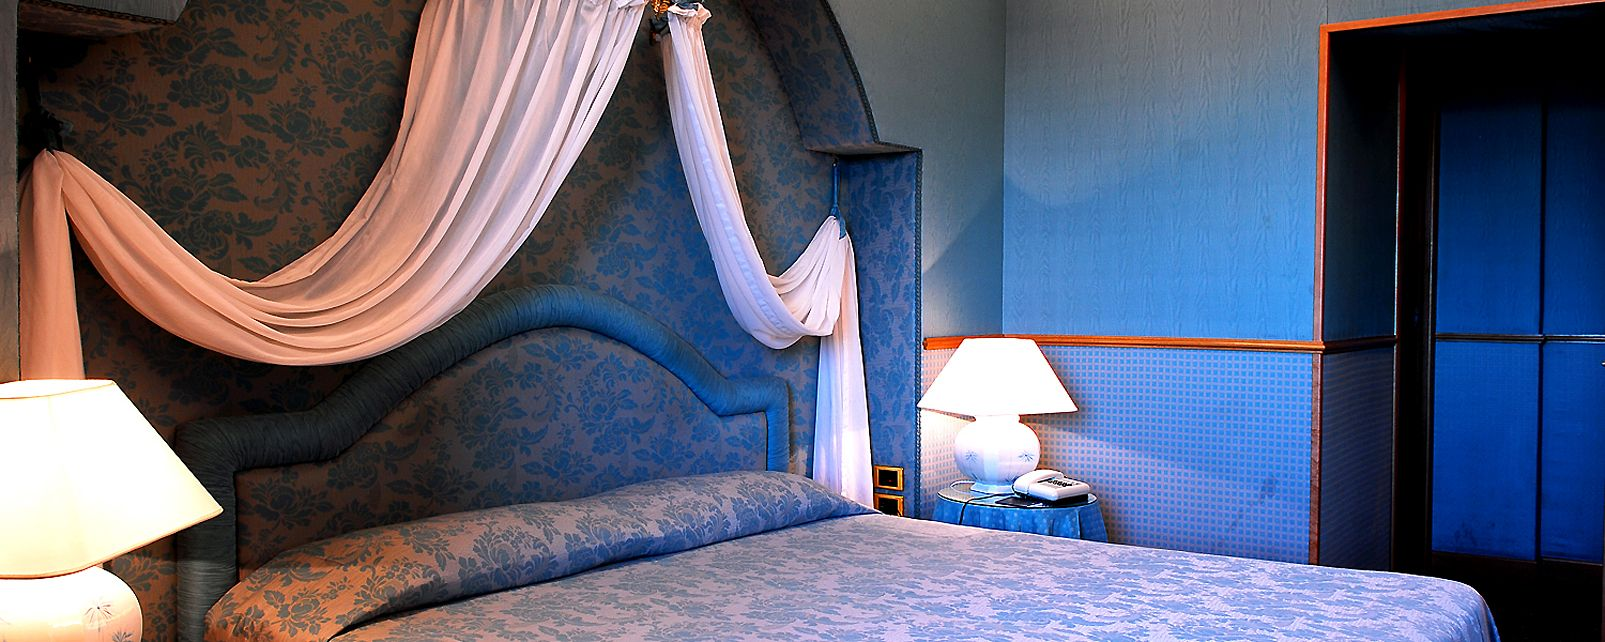 Hotel Marcella Royal